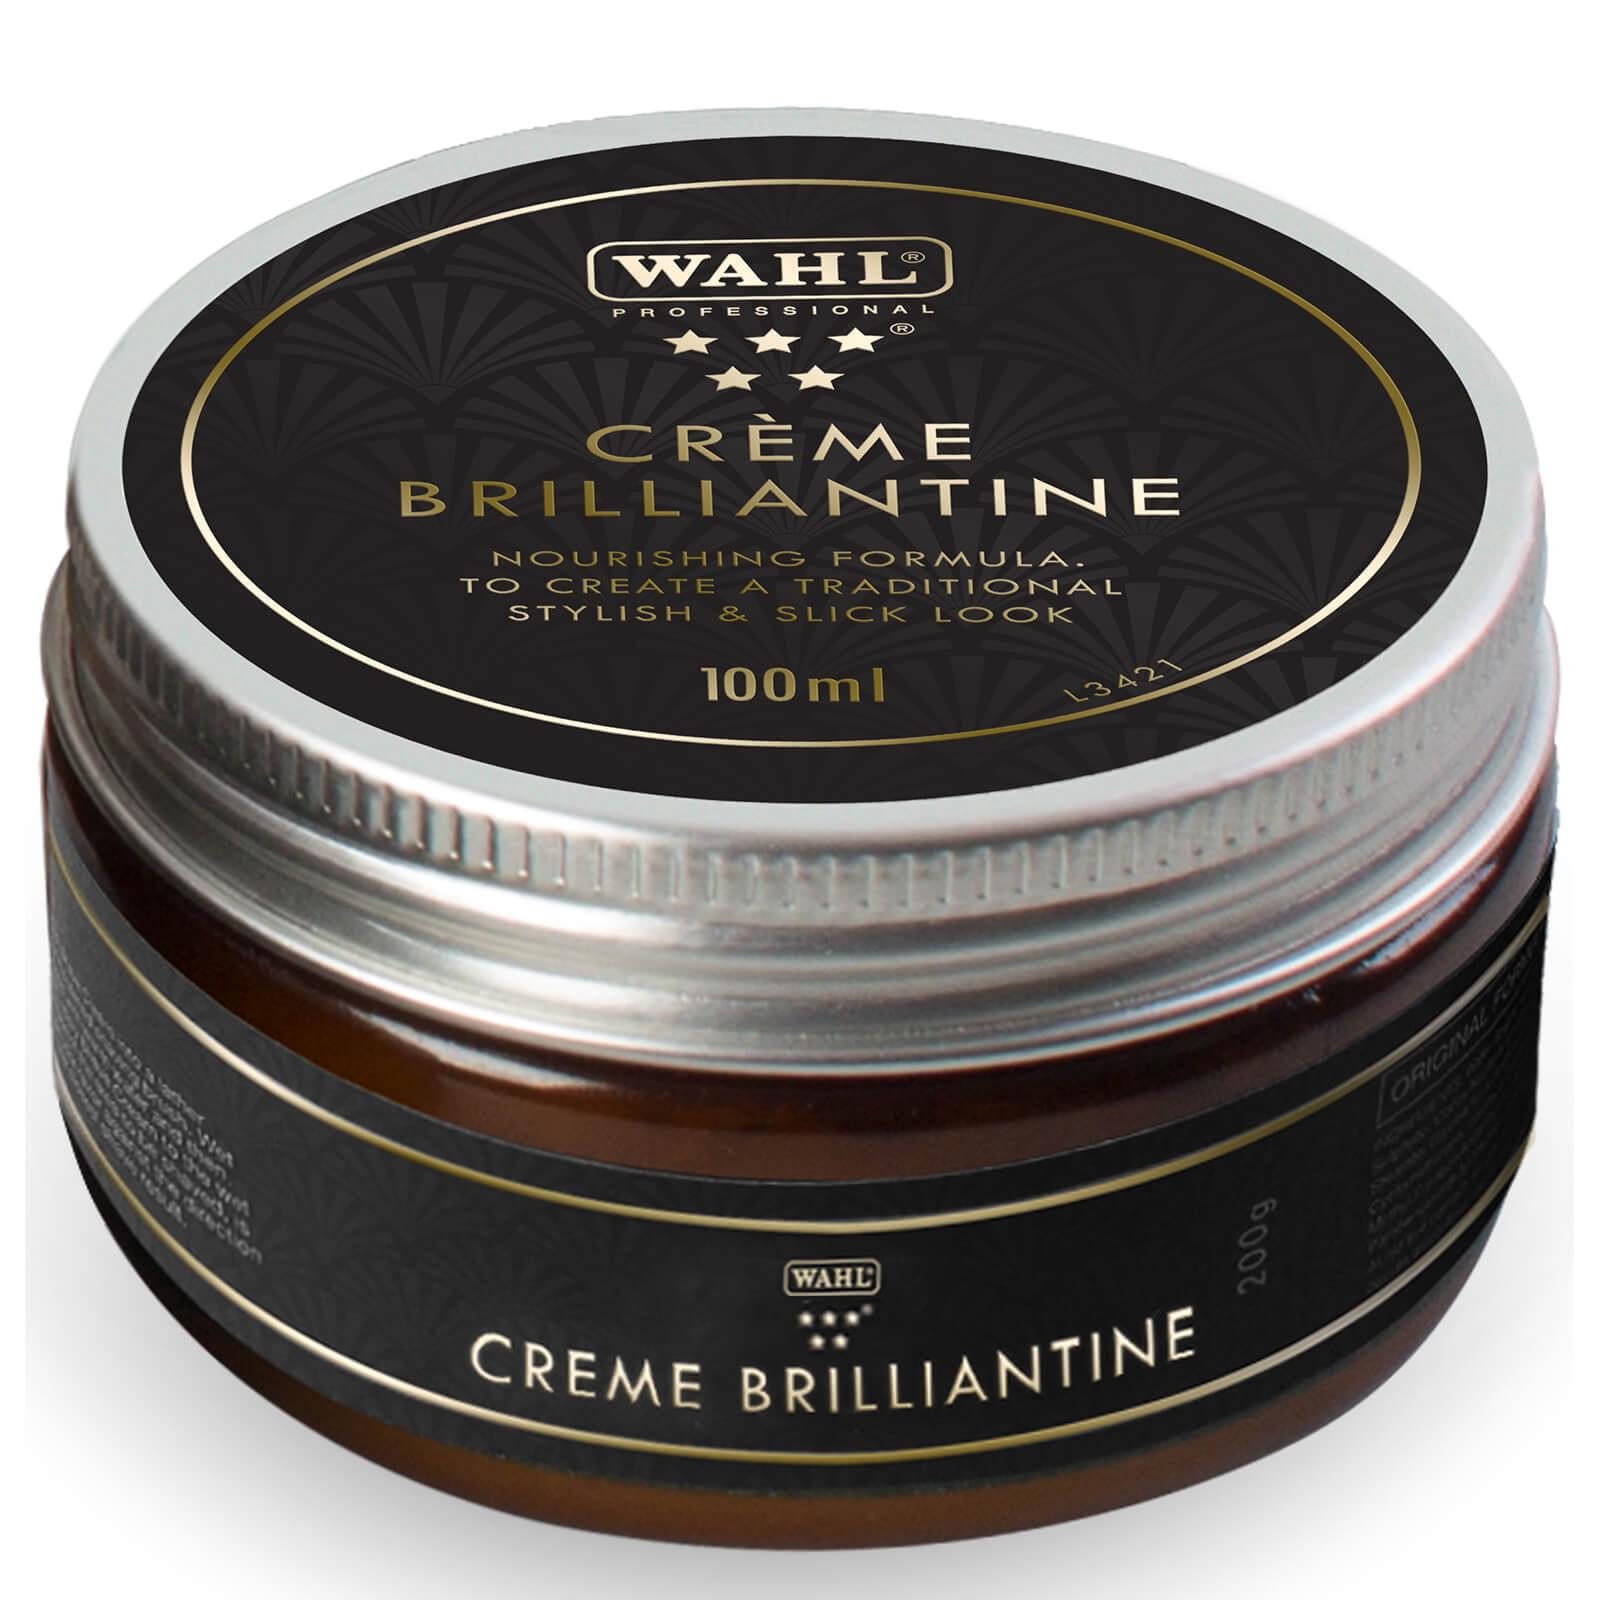 Wahl Crème Brilliantine Wahl 100 ml